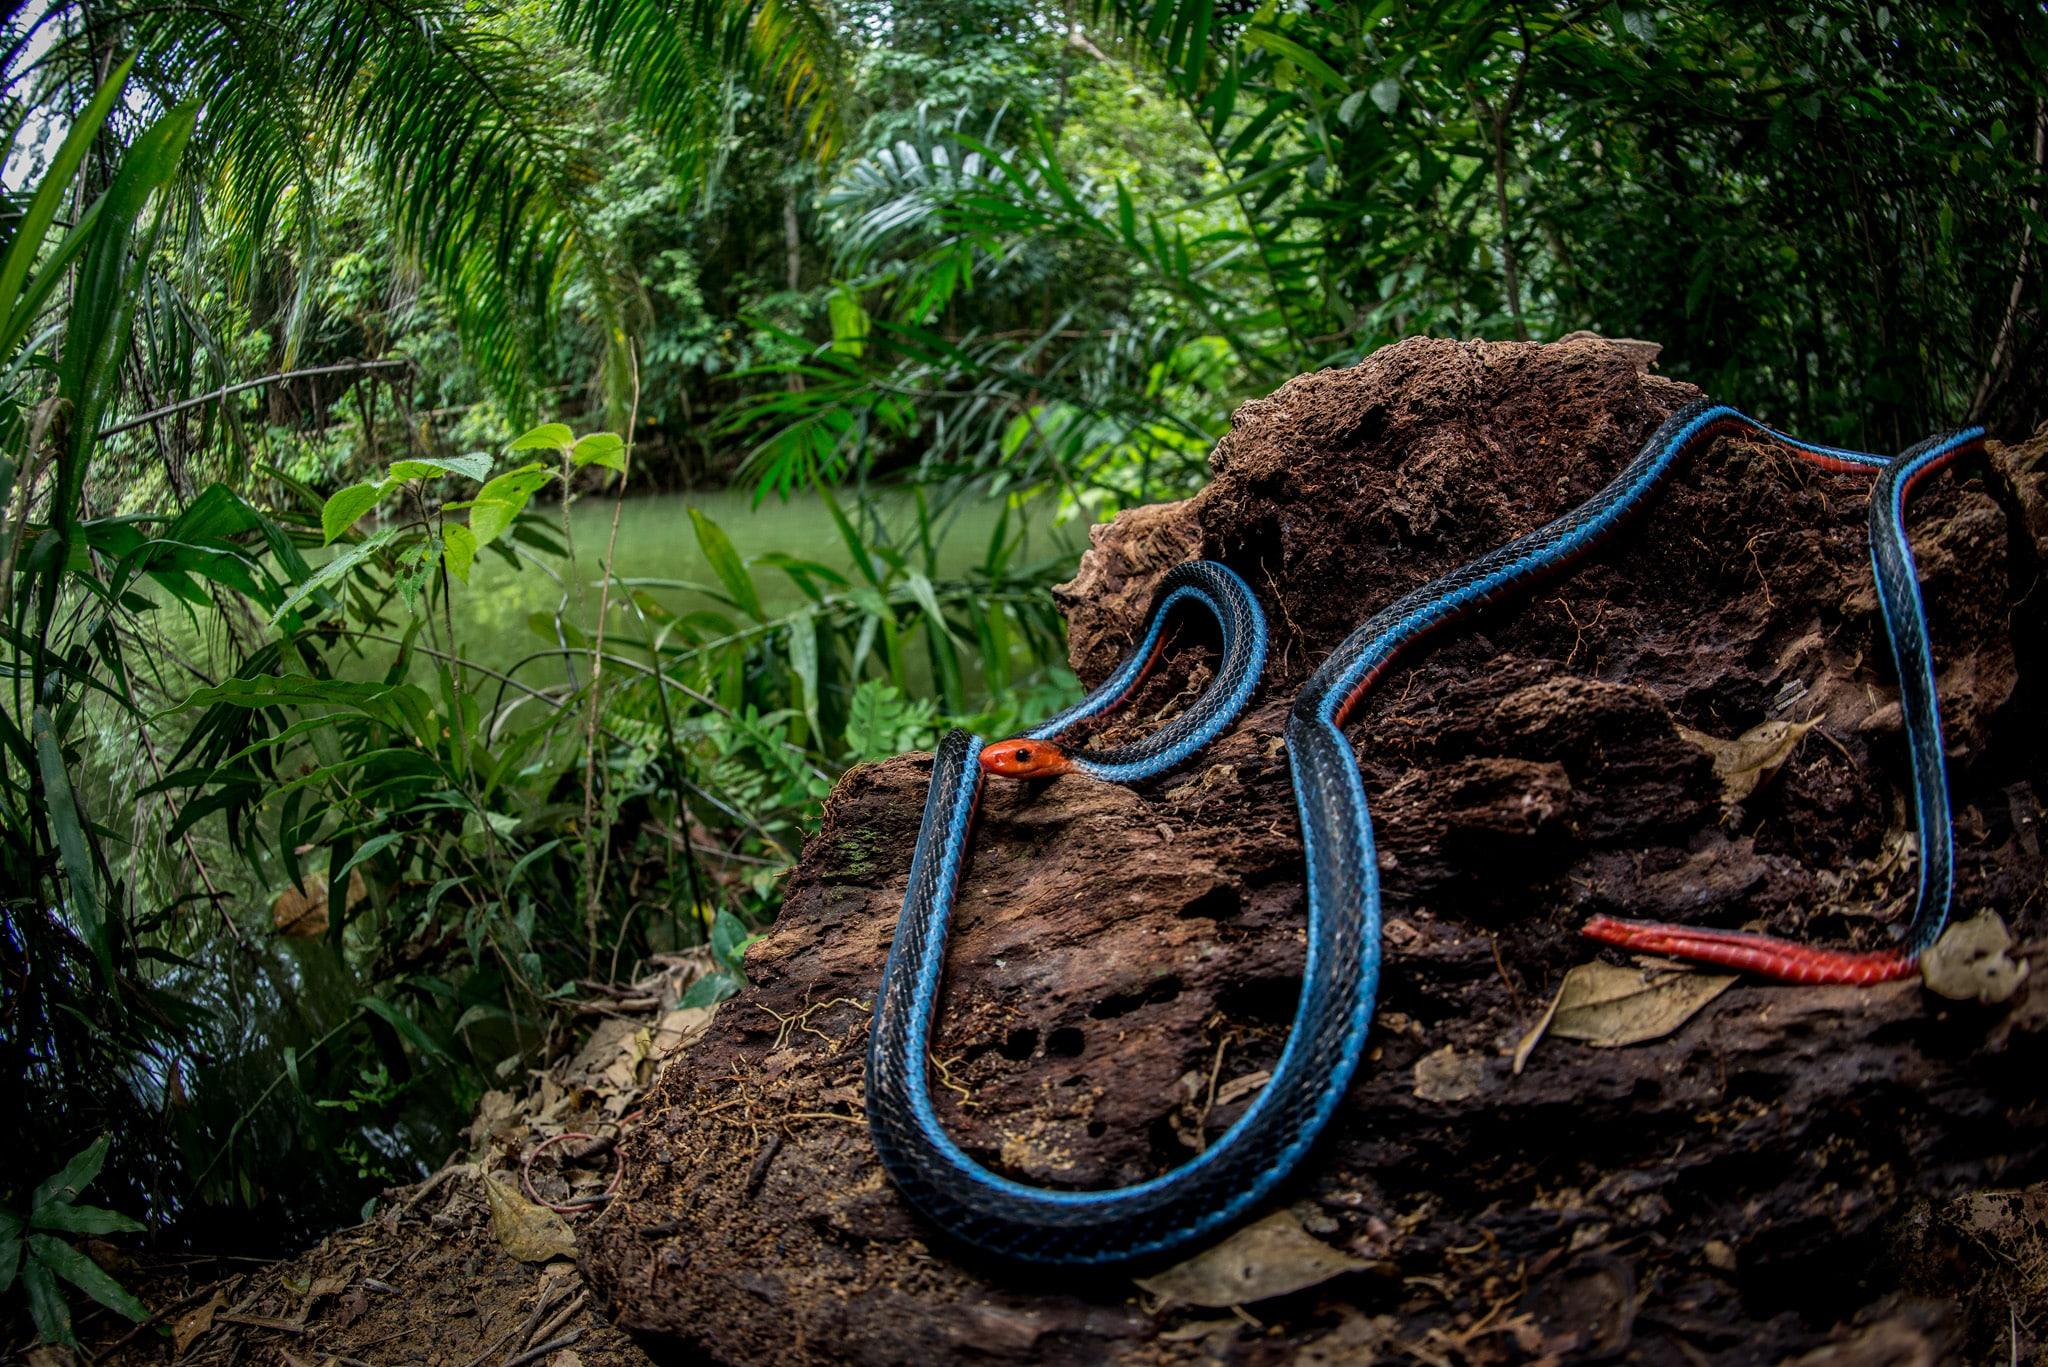 Serpentes: Snakes